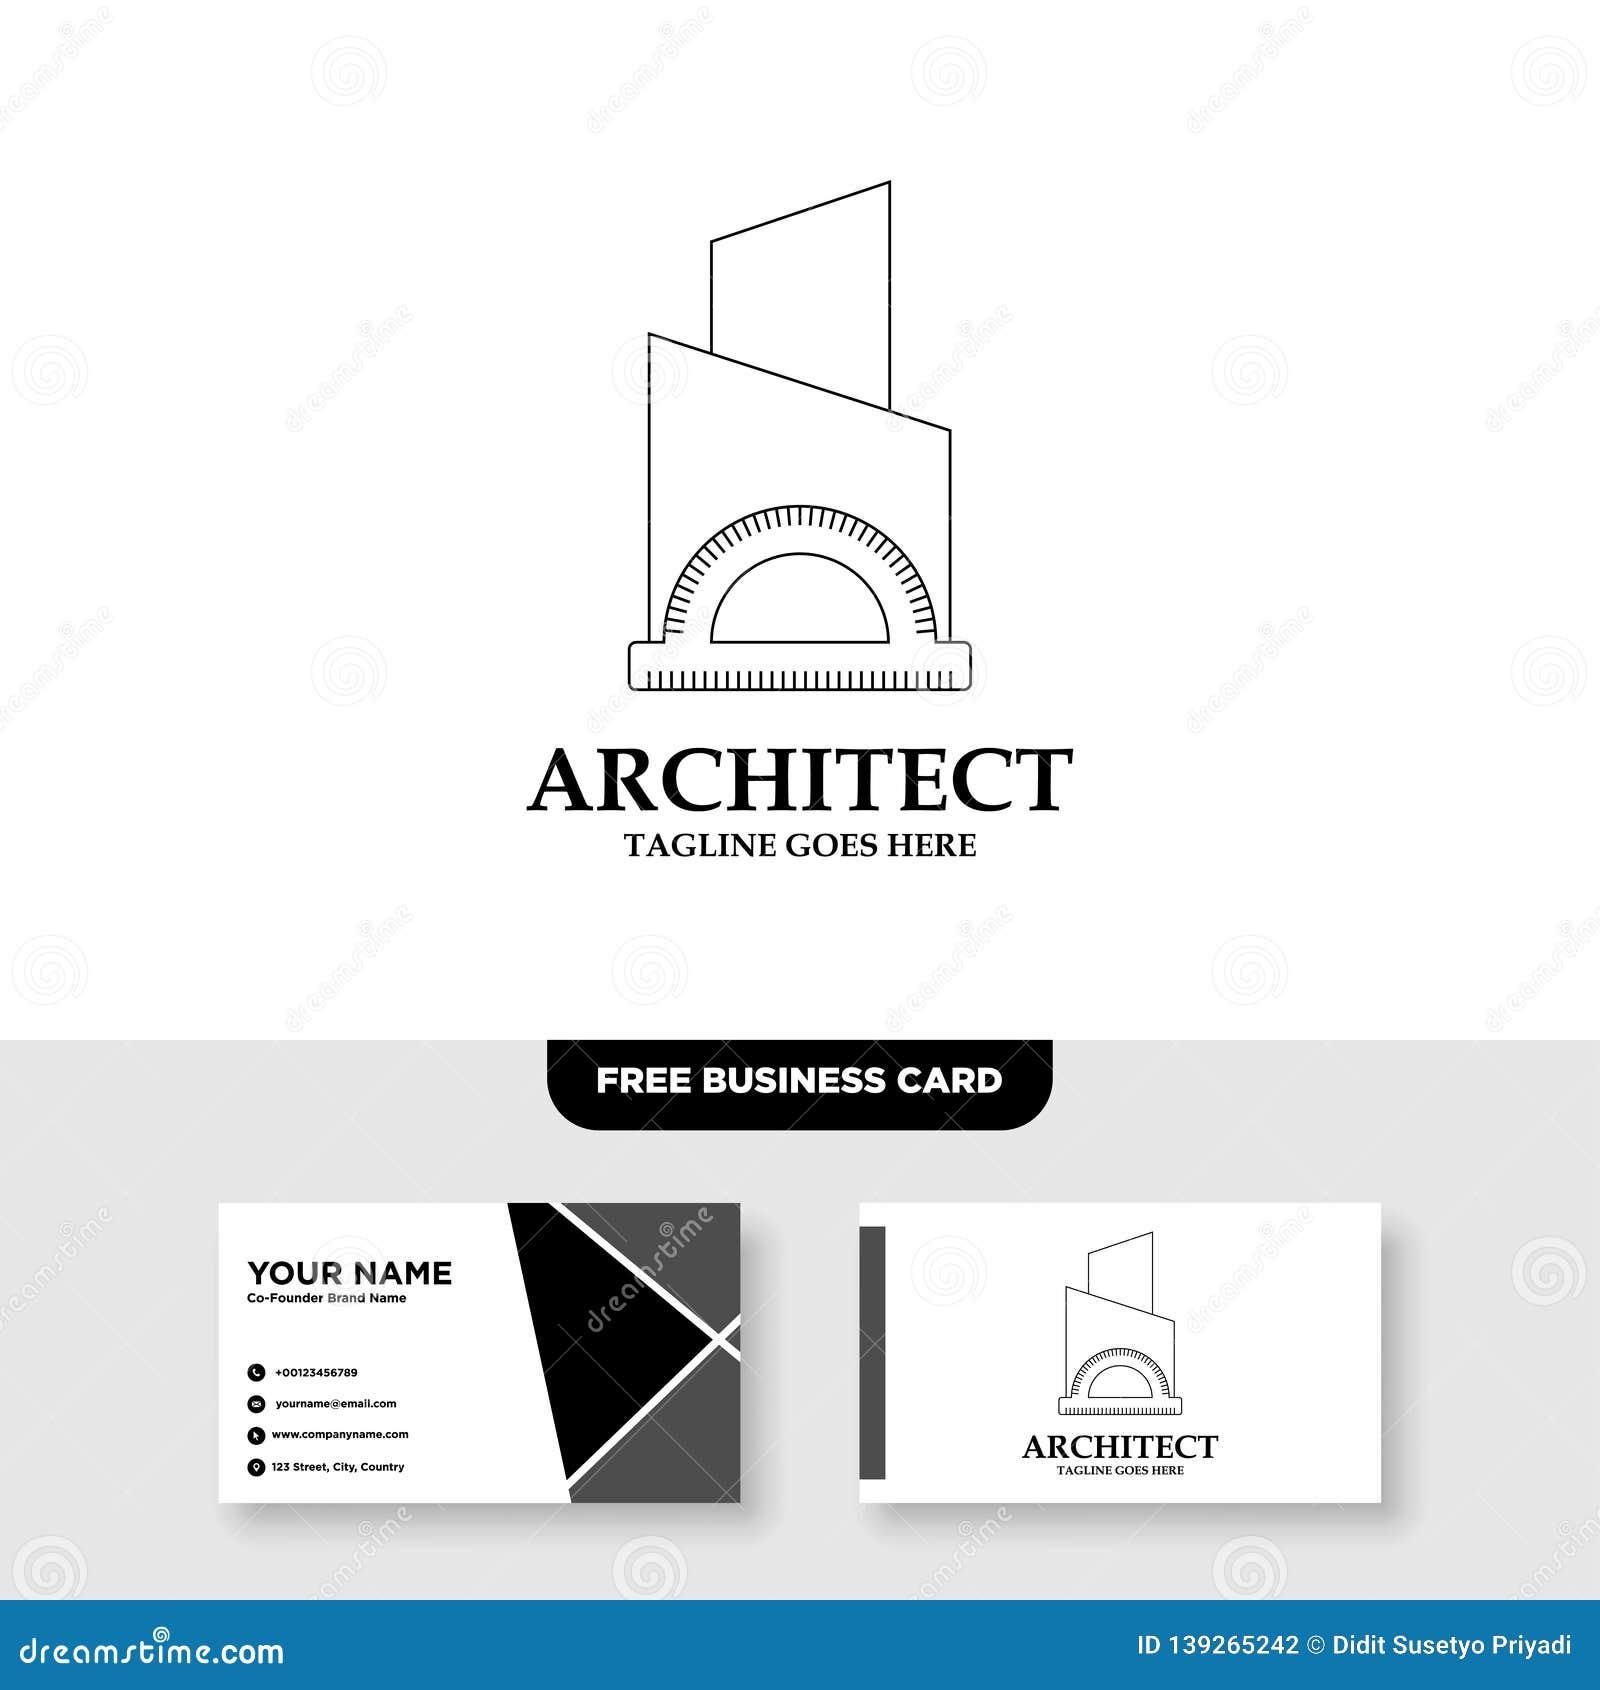 Architecture Company Construction Architect Vector Logo